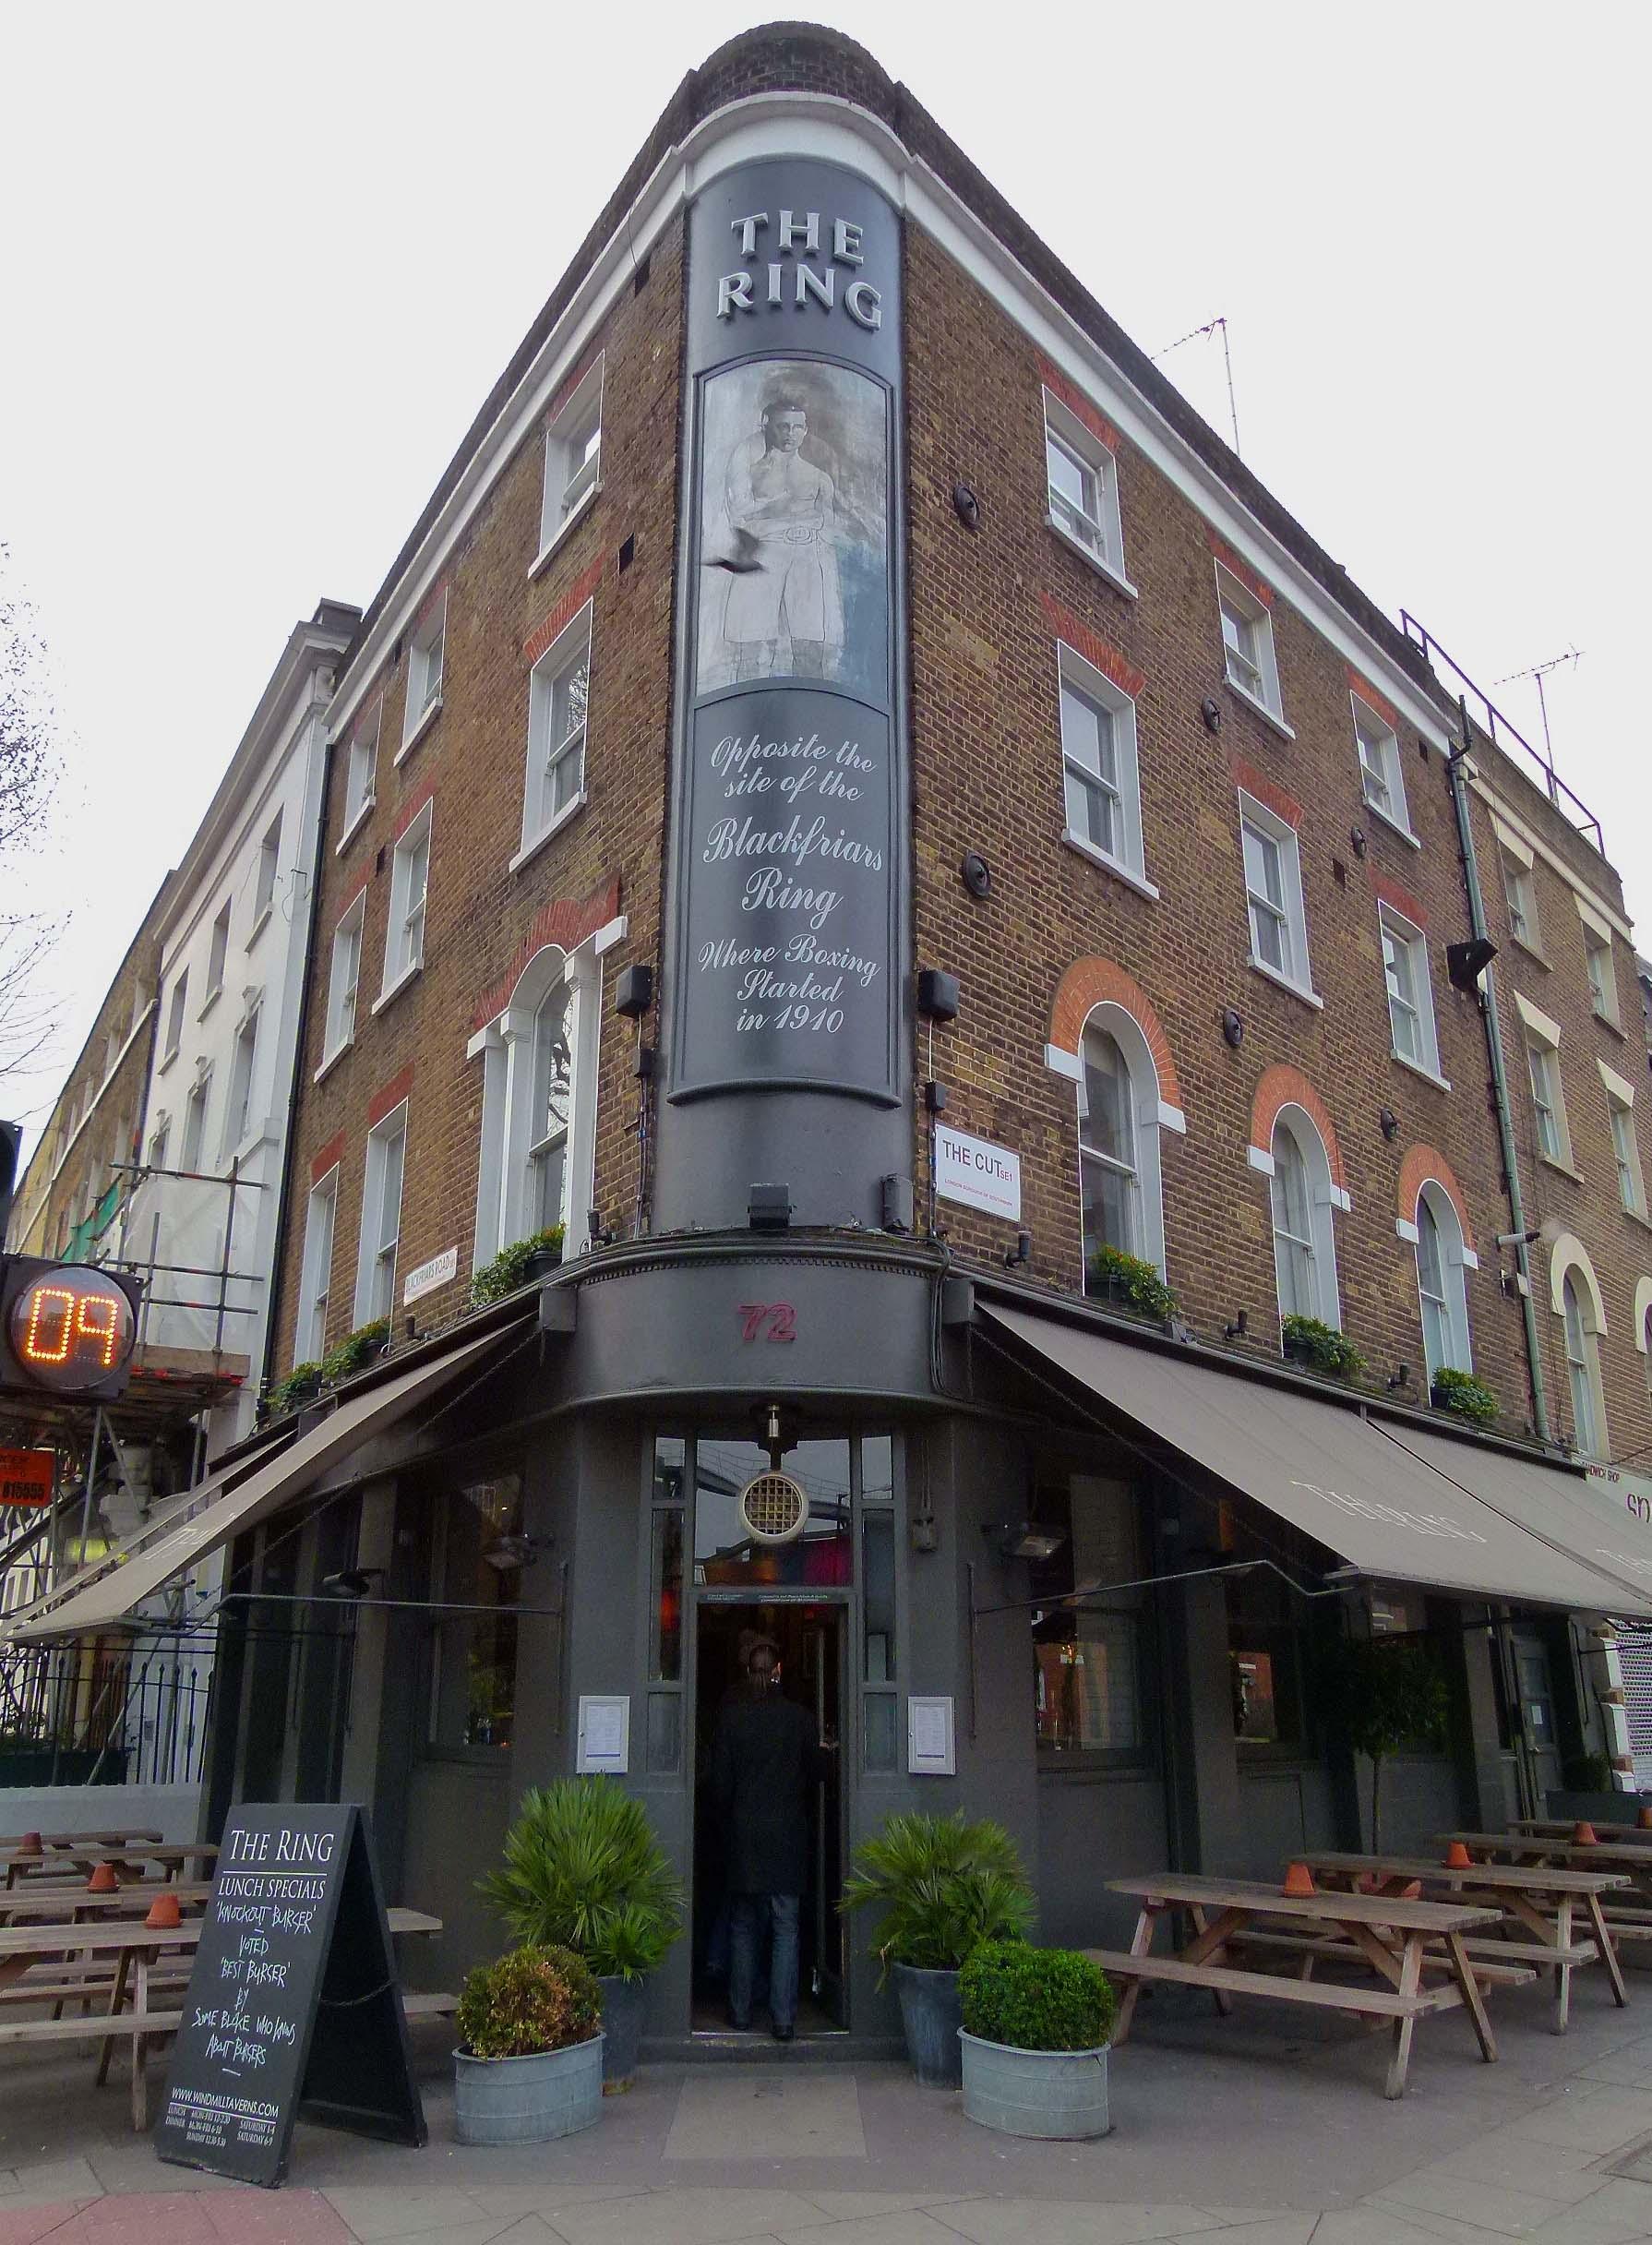 The Ring Pub